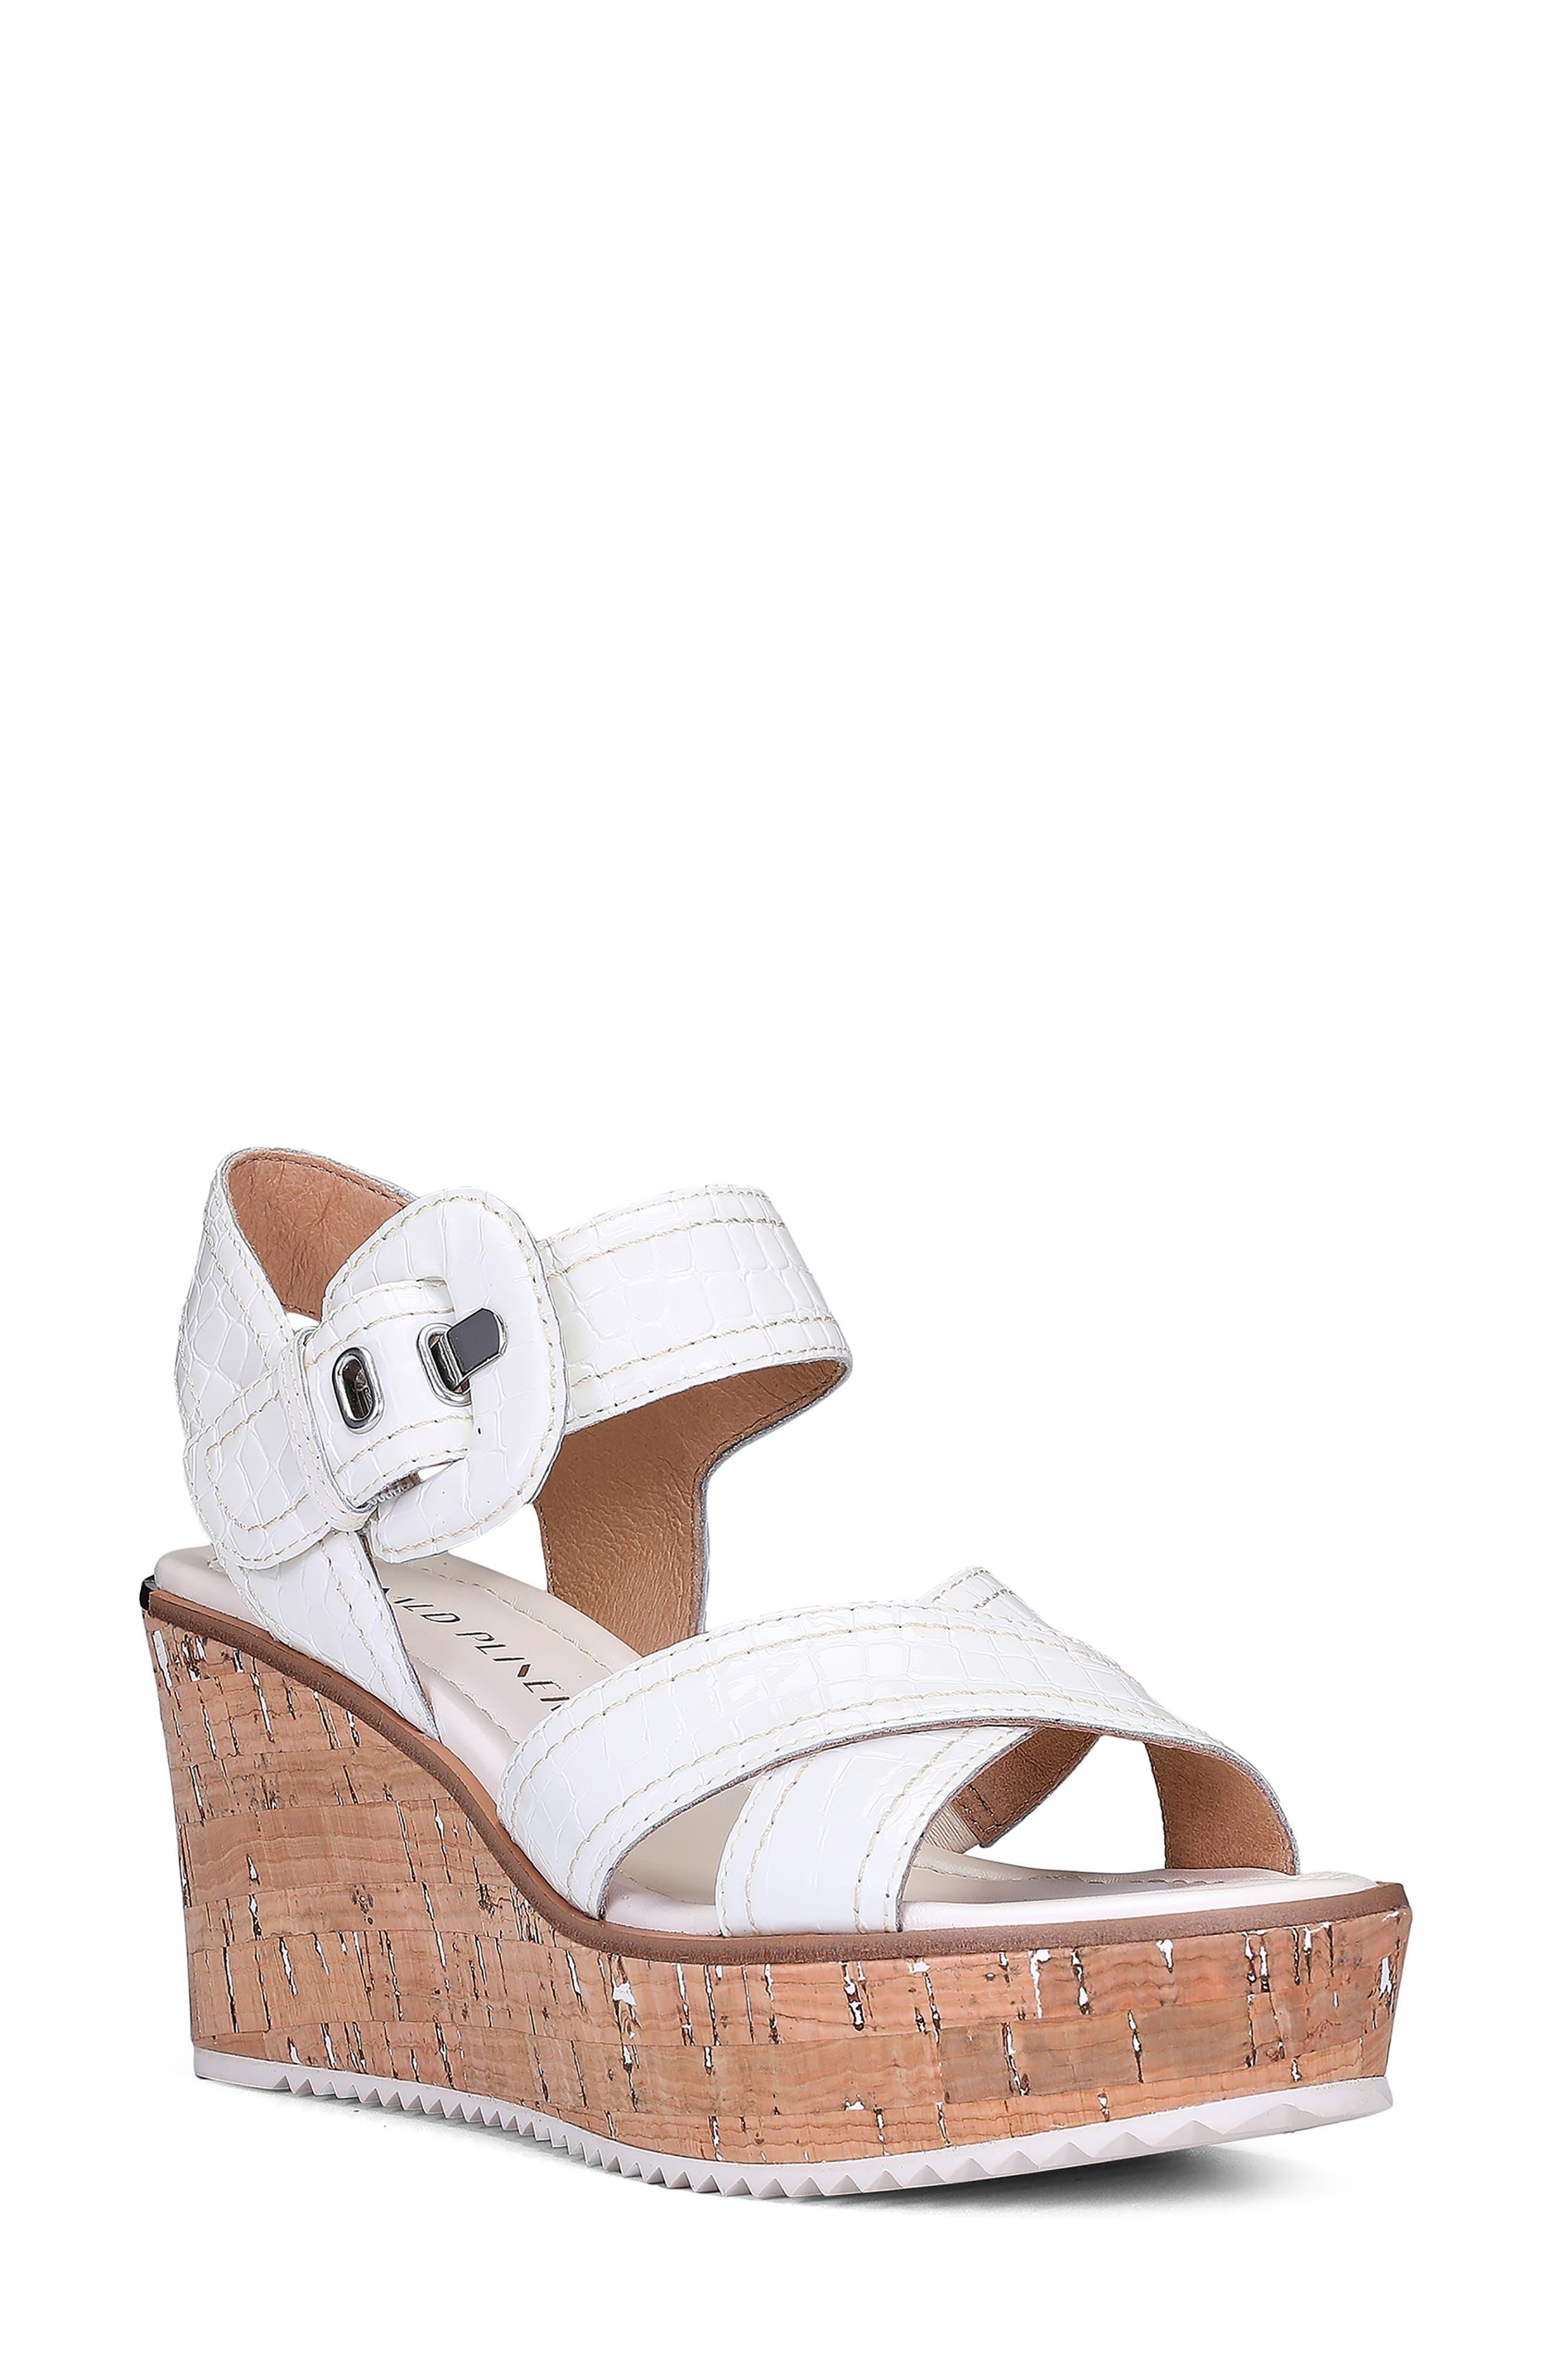 Judee Platform Wedge Sandal